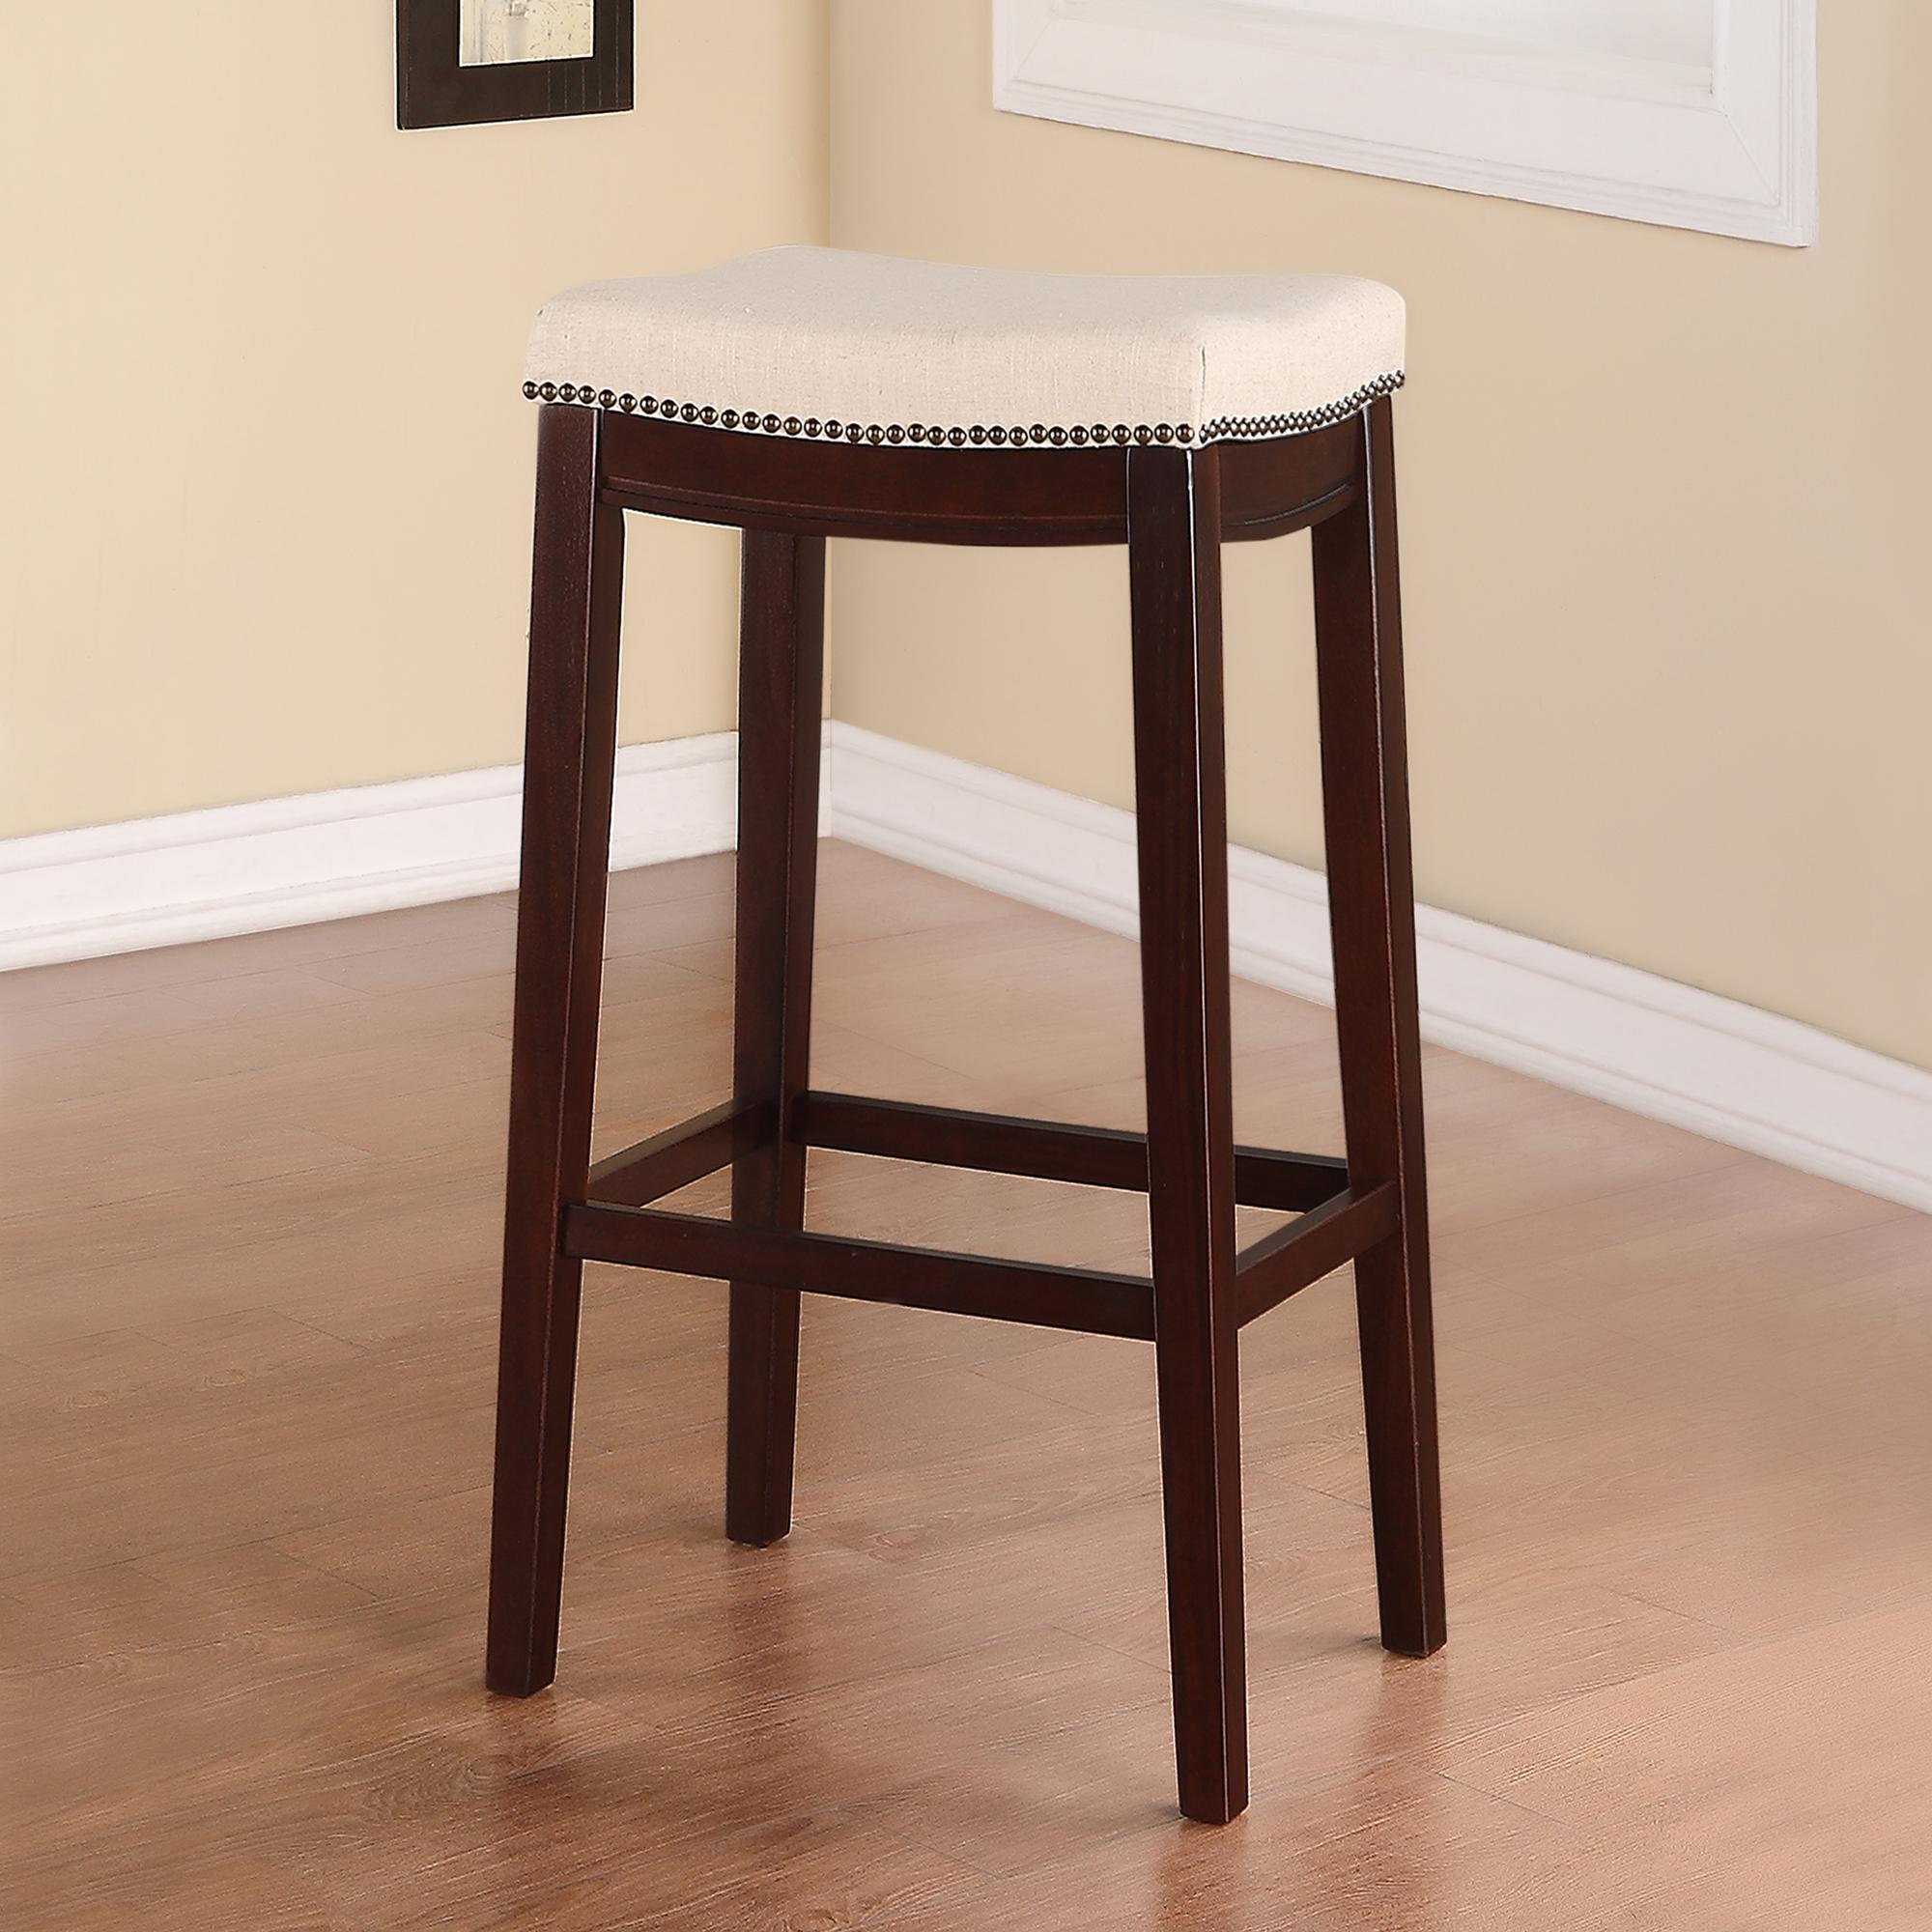 Linon Hampton Fabric Top Bar Stool Beige 31 Inch Seat